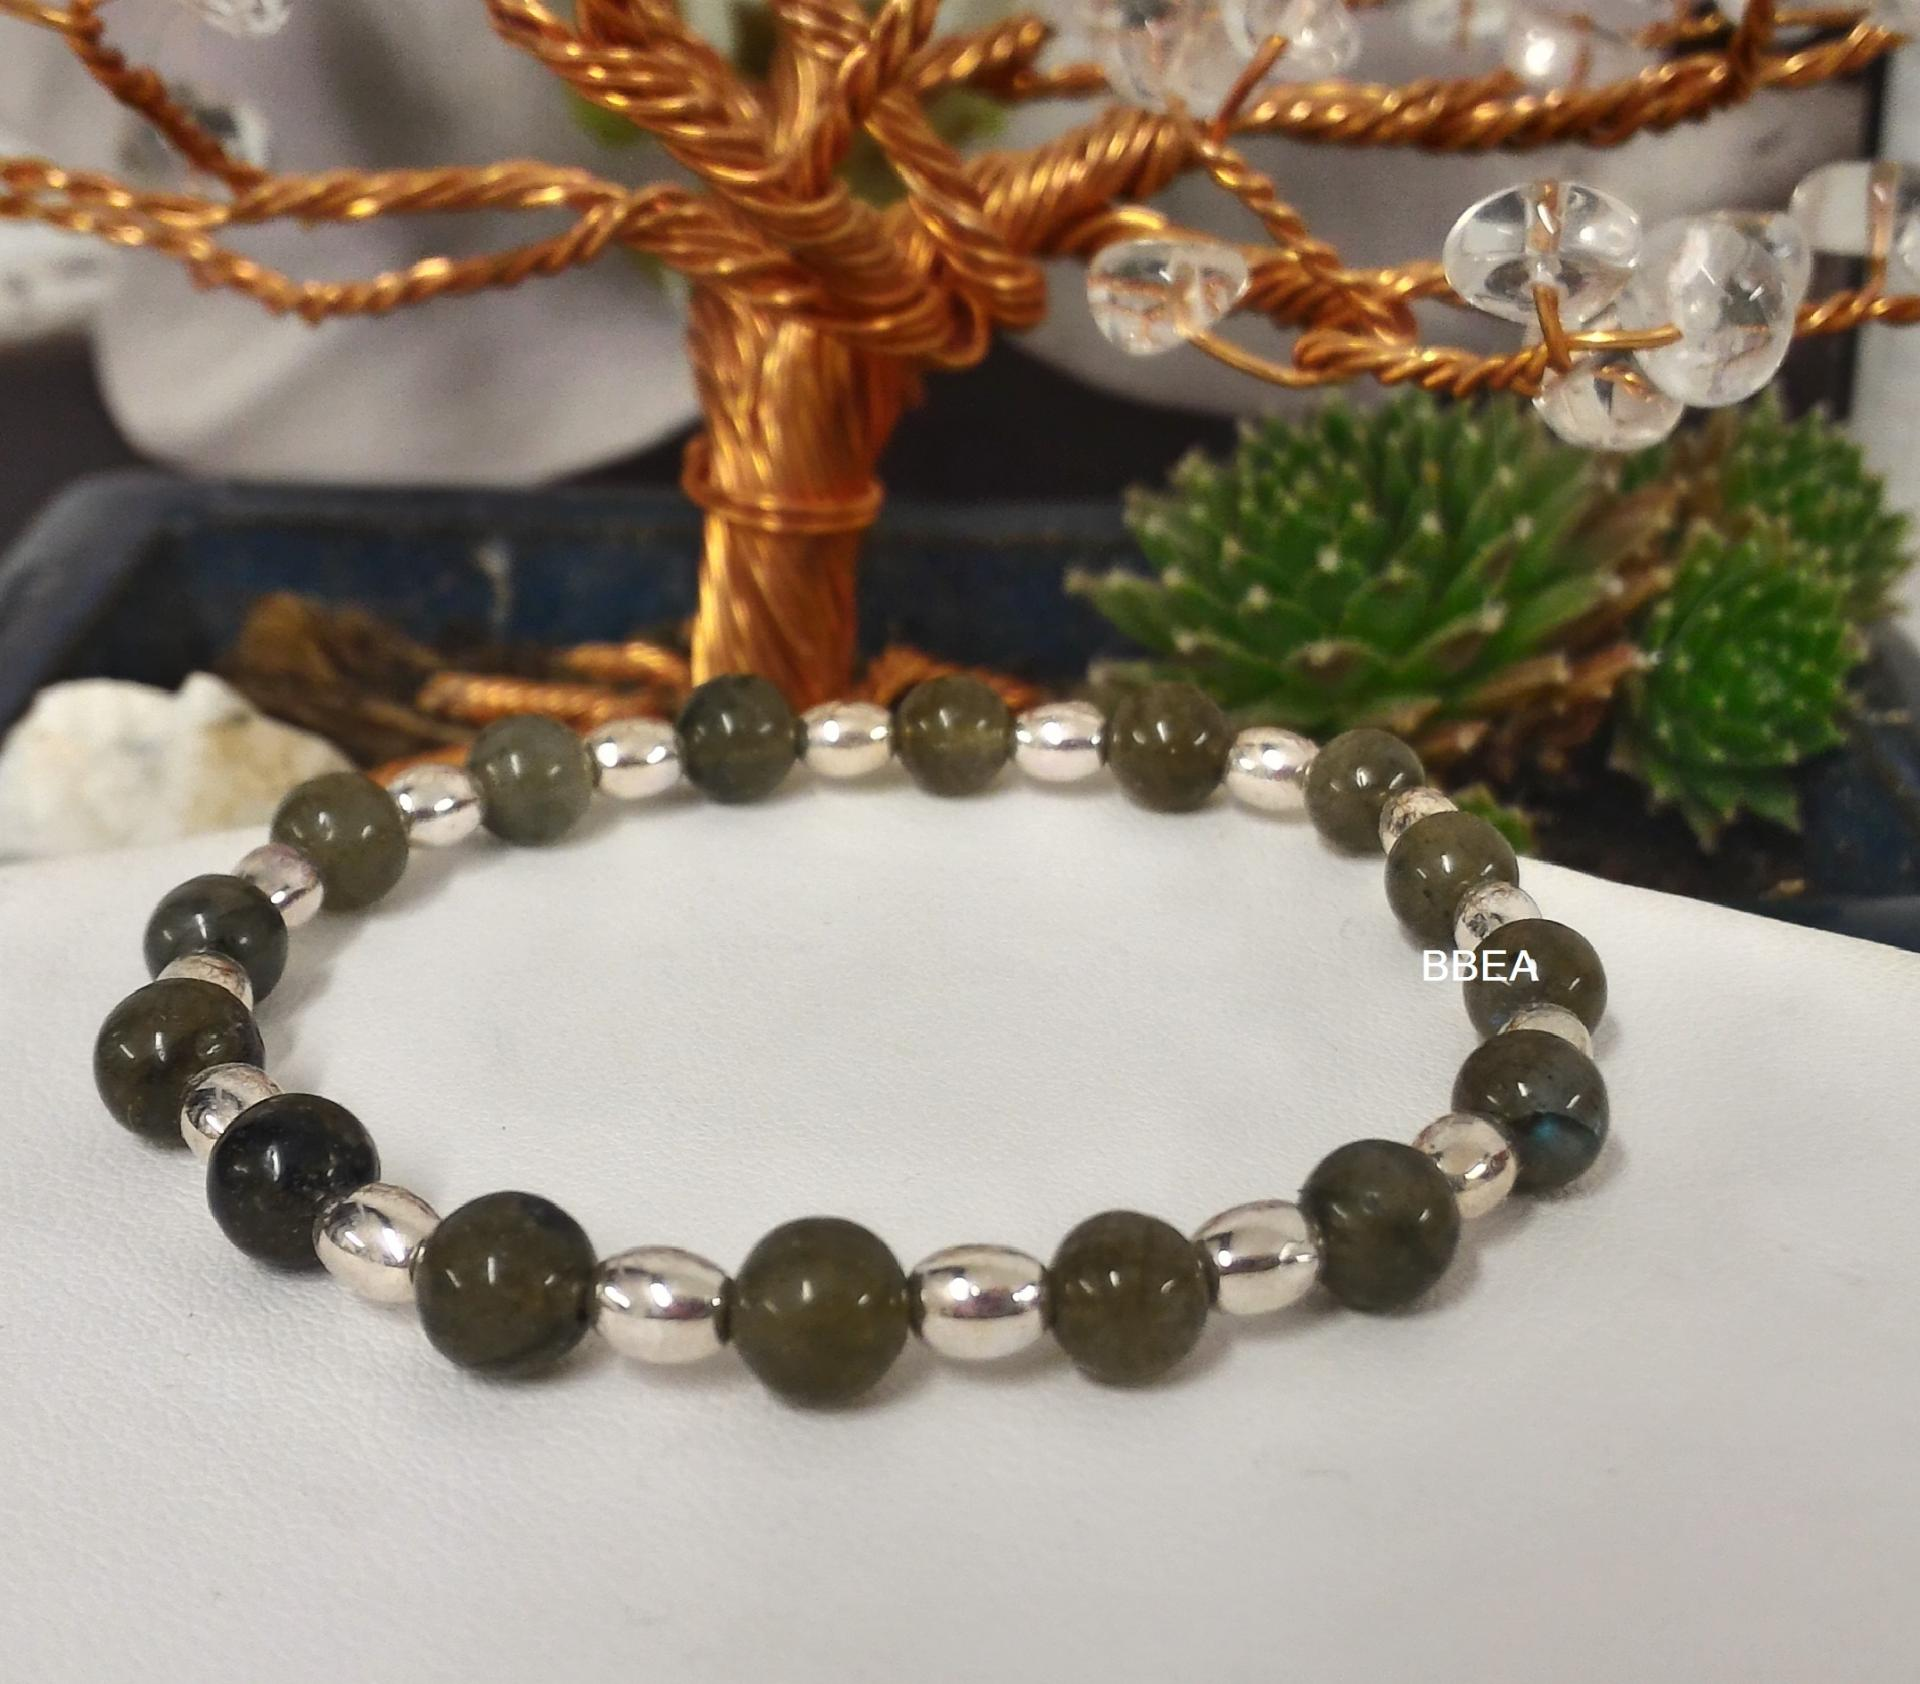 Bracelet labradorite 2